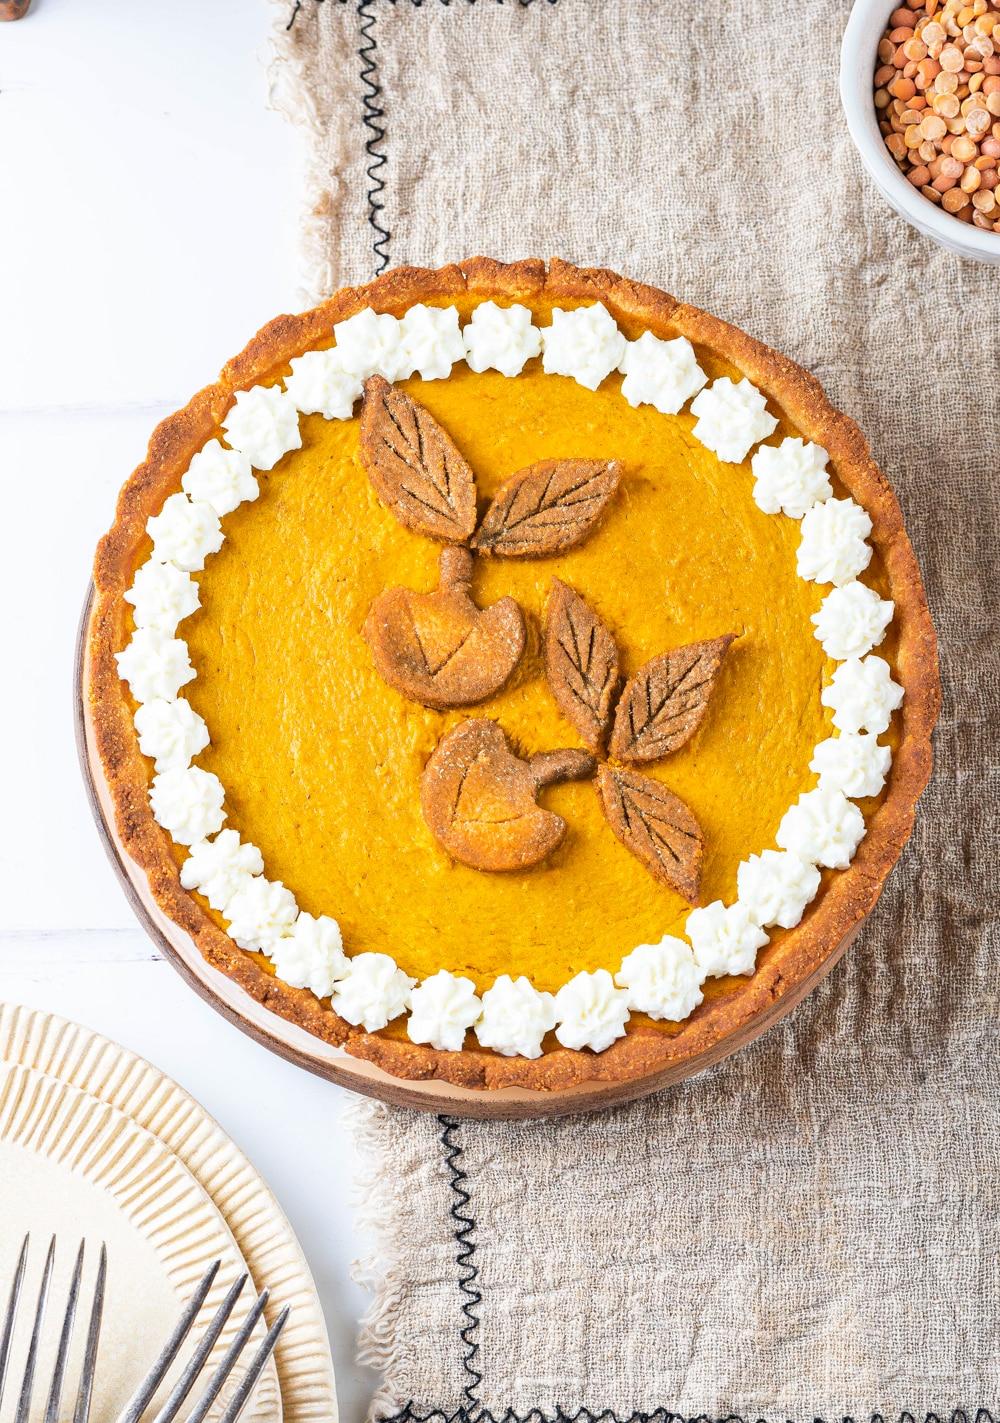 A pumpkin pie set on top of a tan napkin.